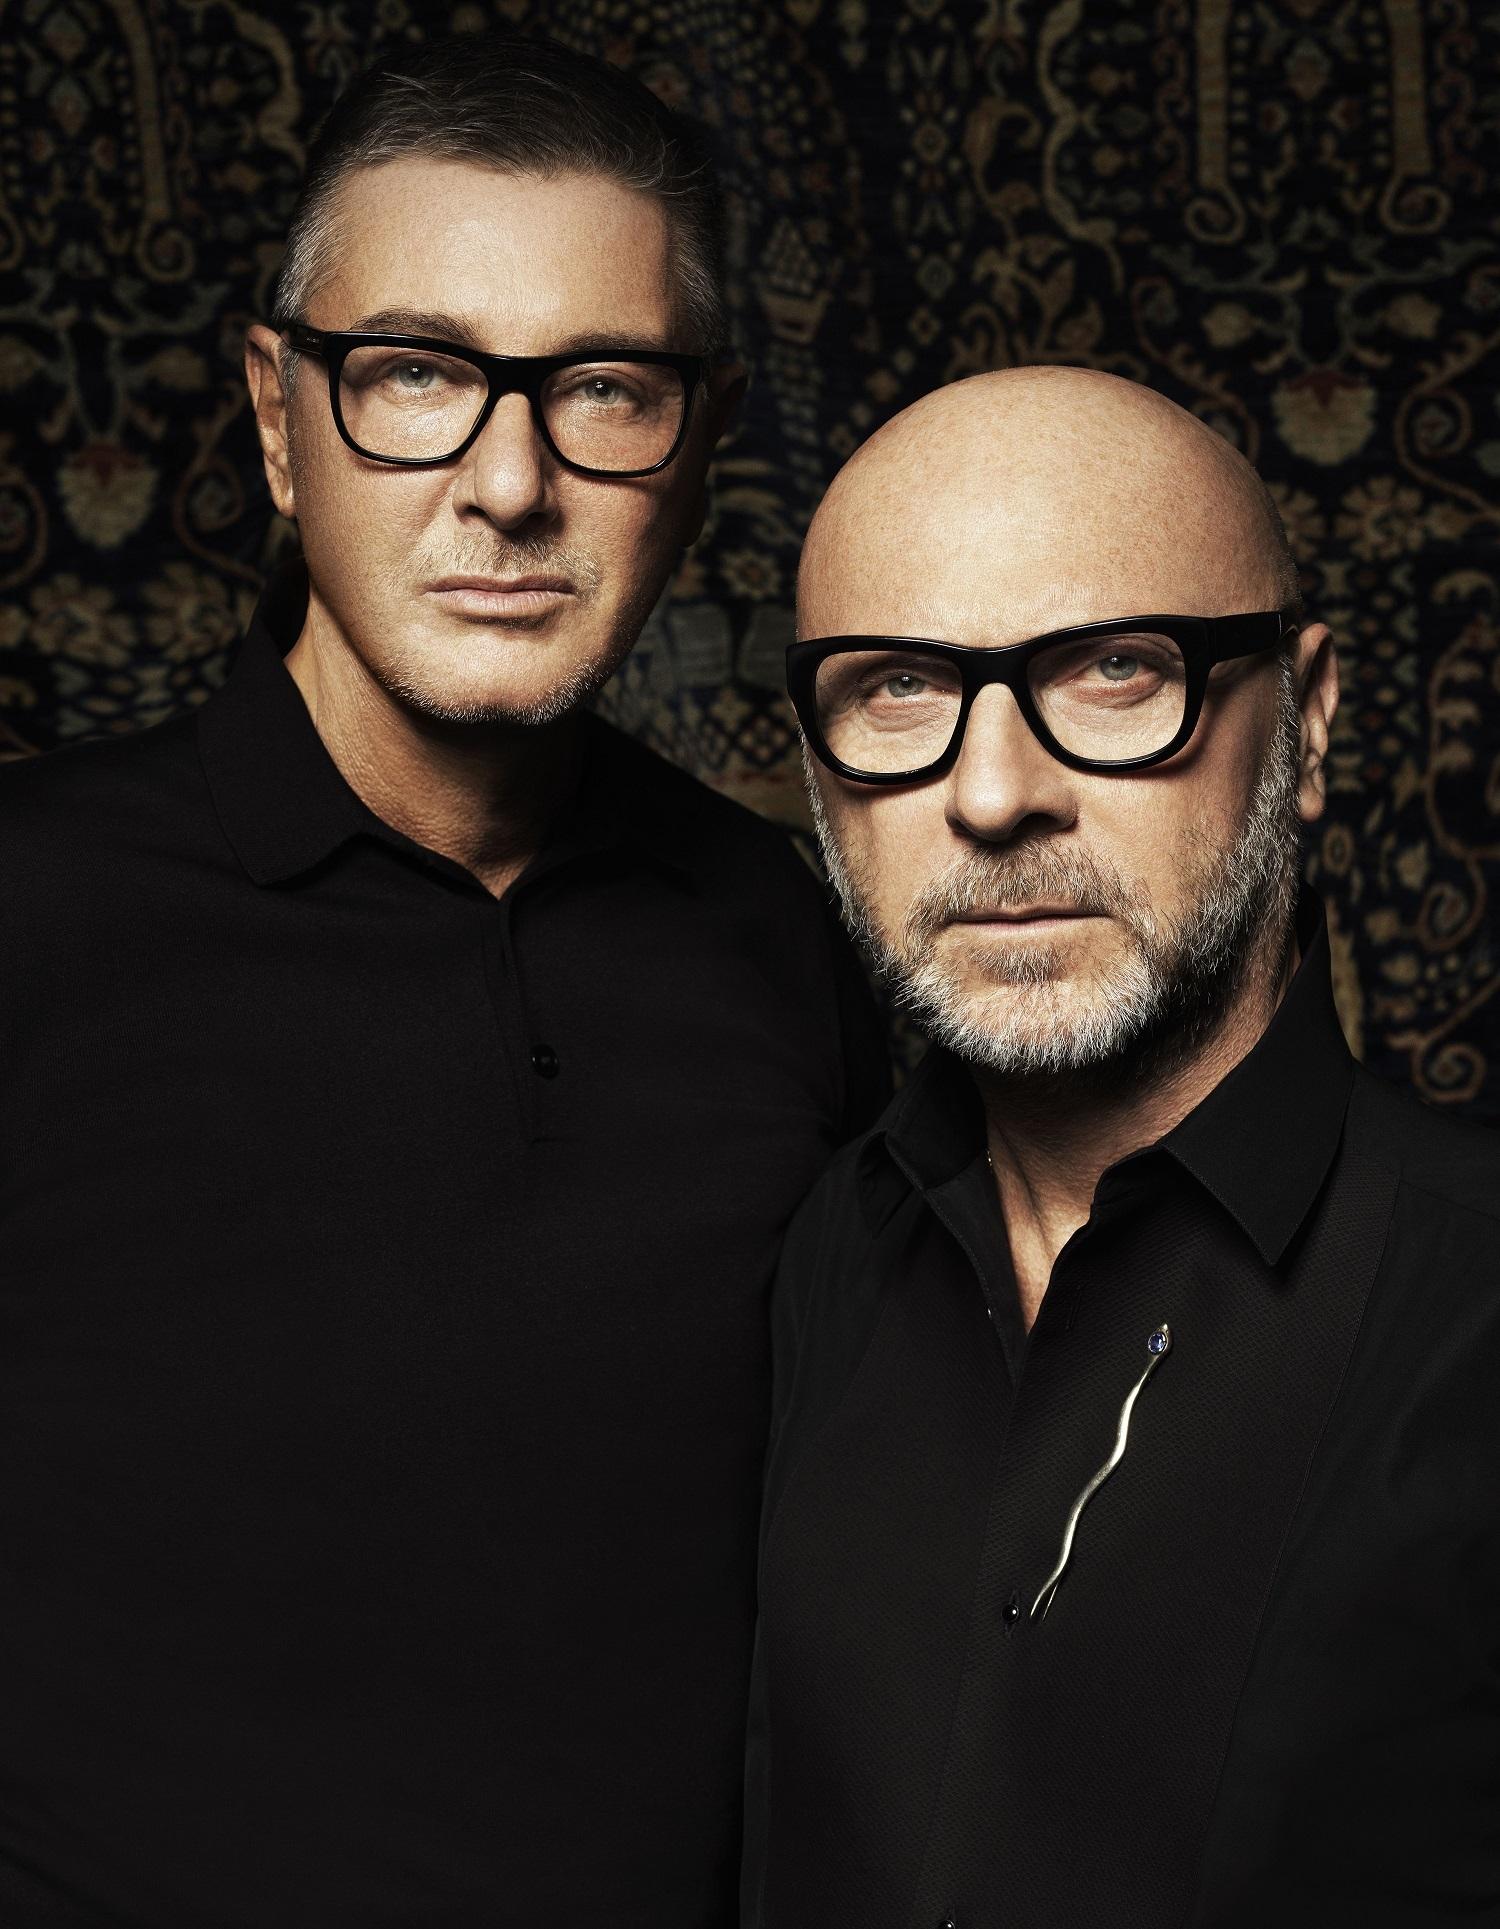 Stefano Gabbana y Domenico Dolce.